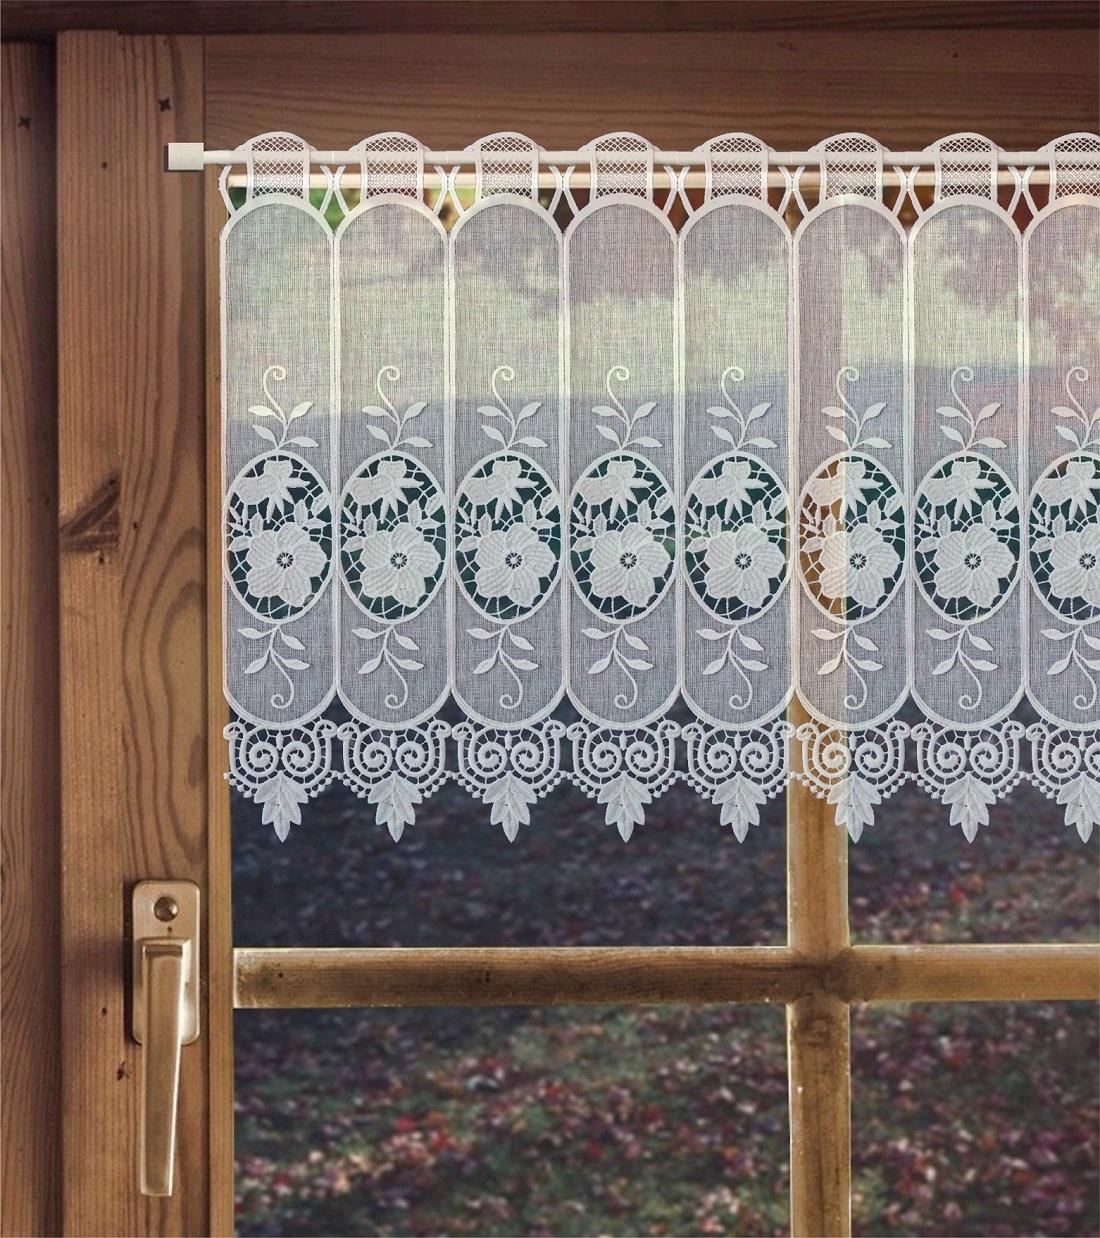 gardinen welt online shop scheibengardine aus plauener spitze spitzengardine zierlauch h he. Black Bedroom Furniture Sets. Home Design Ideas